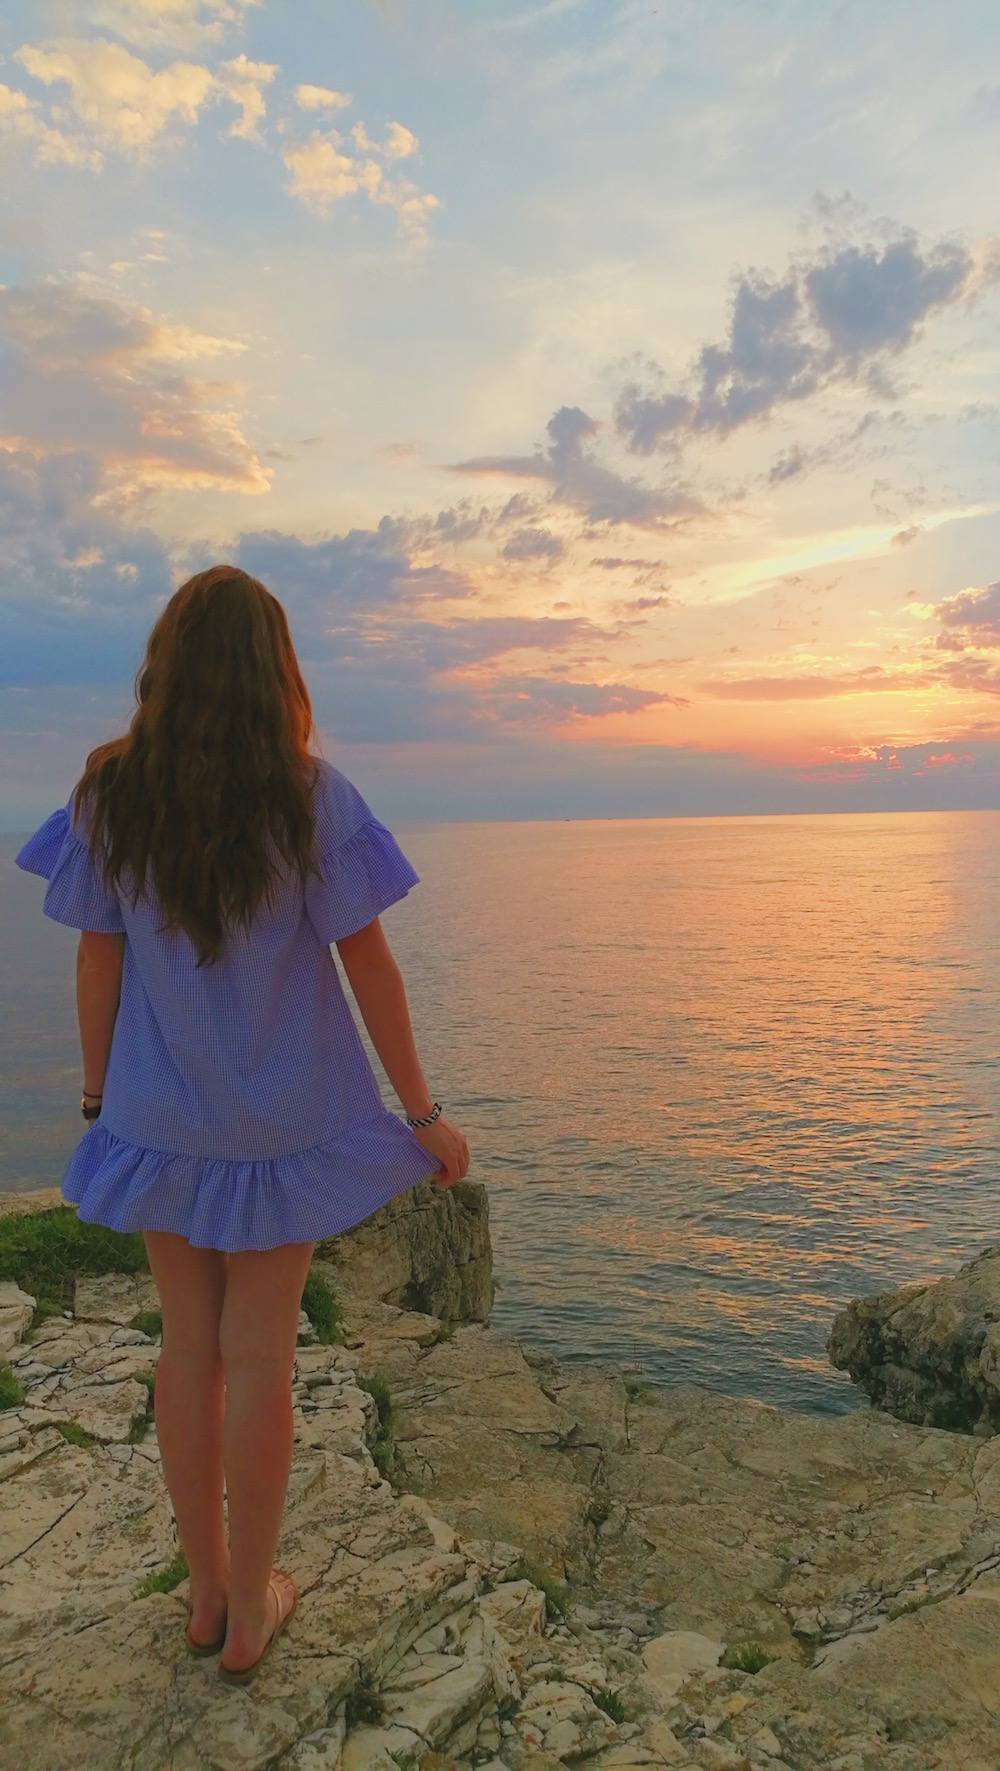 croatia sunsets.JPG